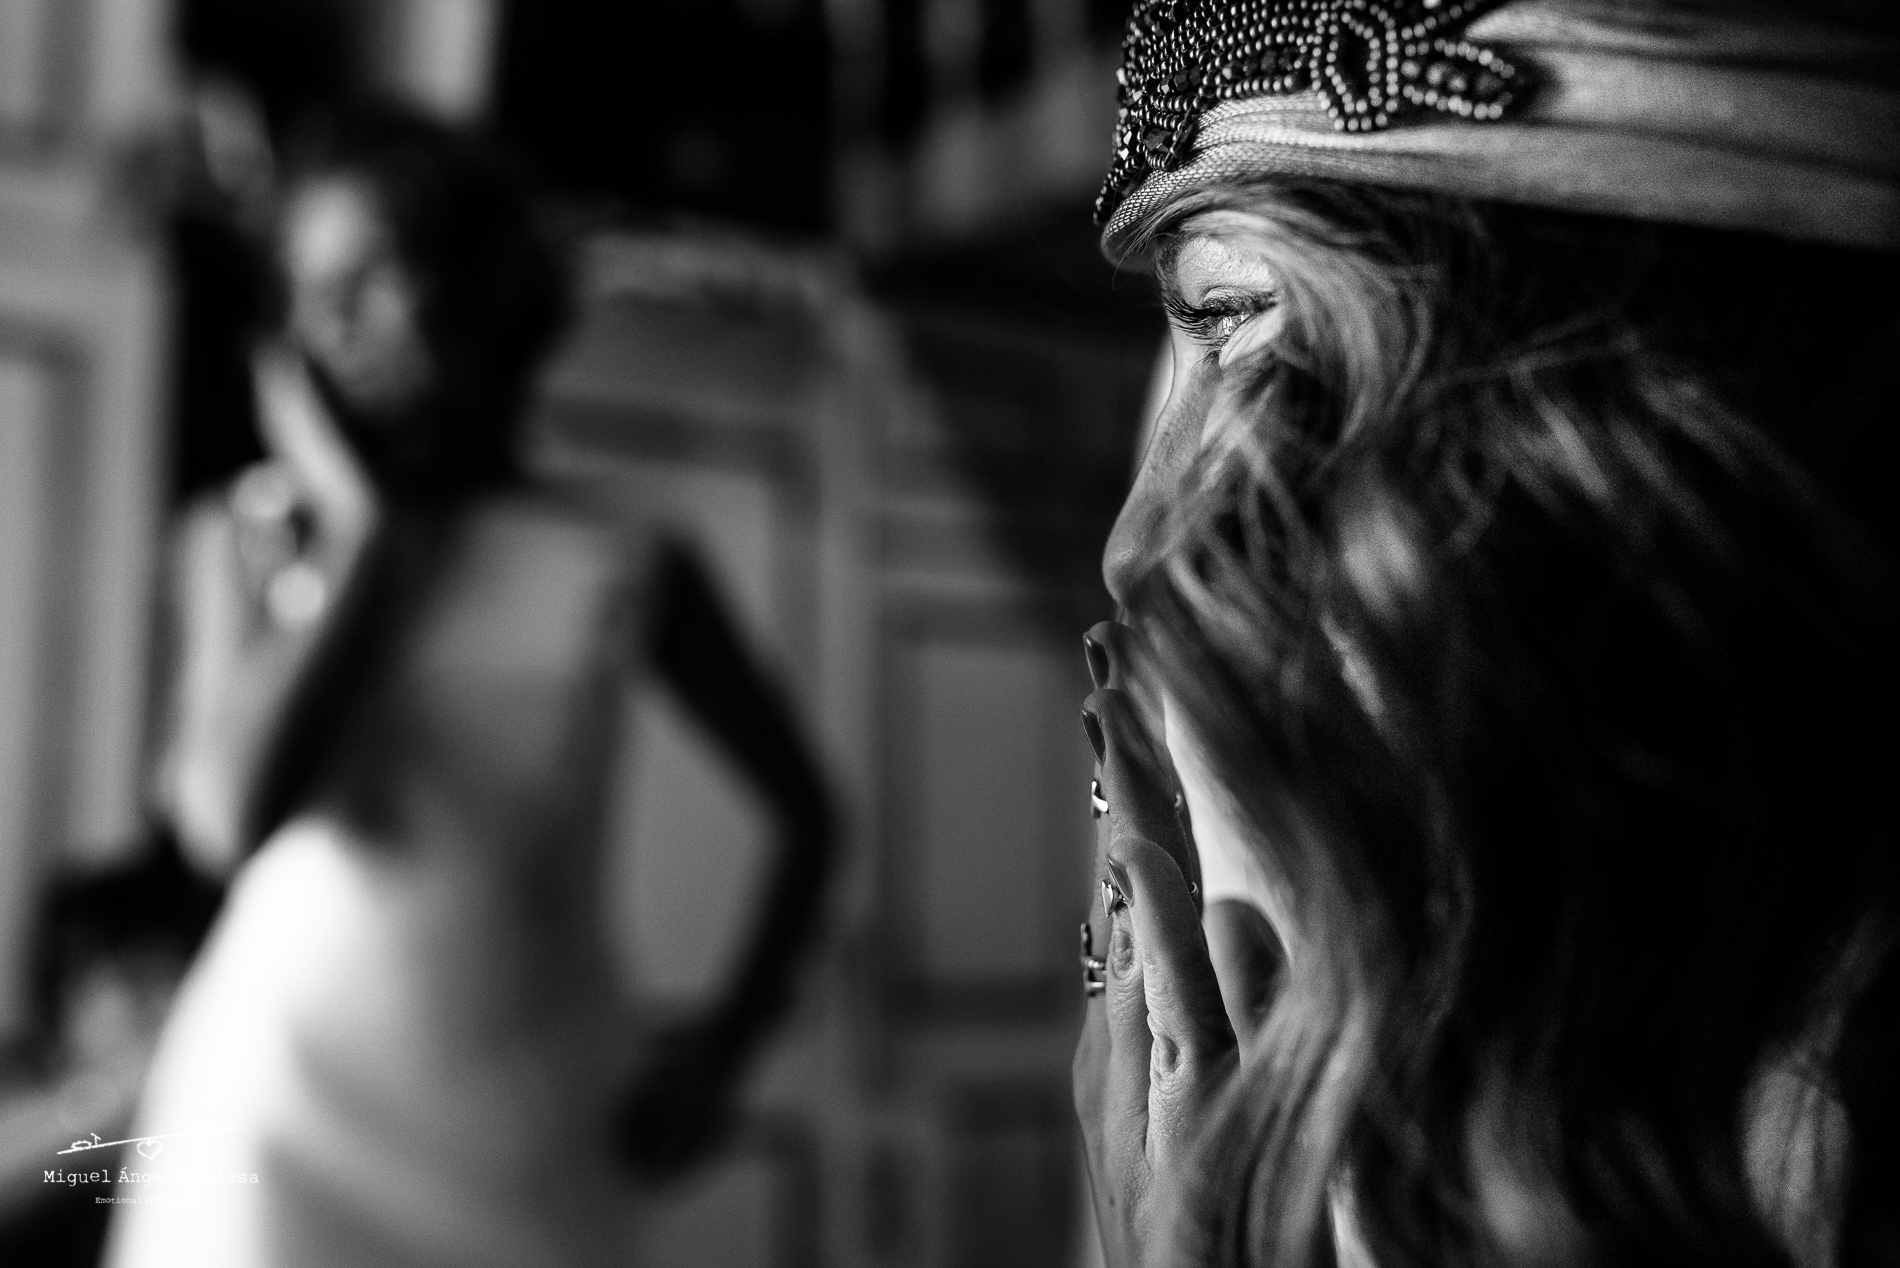 boda, fotografia de boda, boda zaragoza, fotografia, wedding, wedding photography, miguel angel muniesa, fotografo boda Zaragoza, fotografo boda, destination wedding_ 015